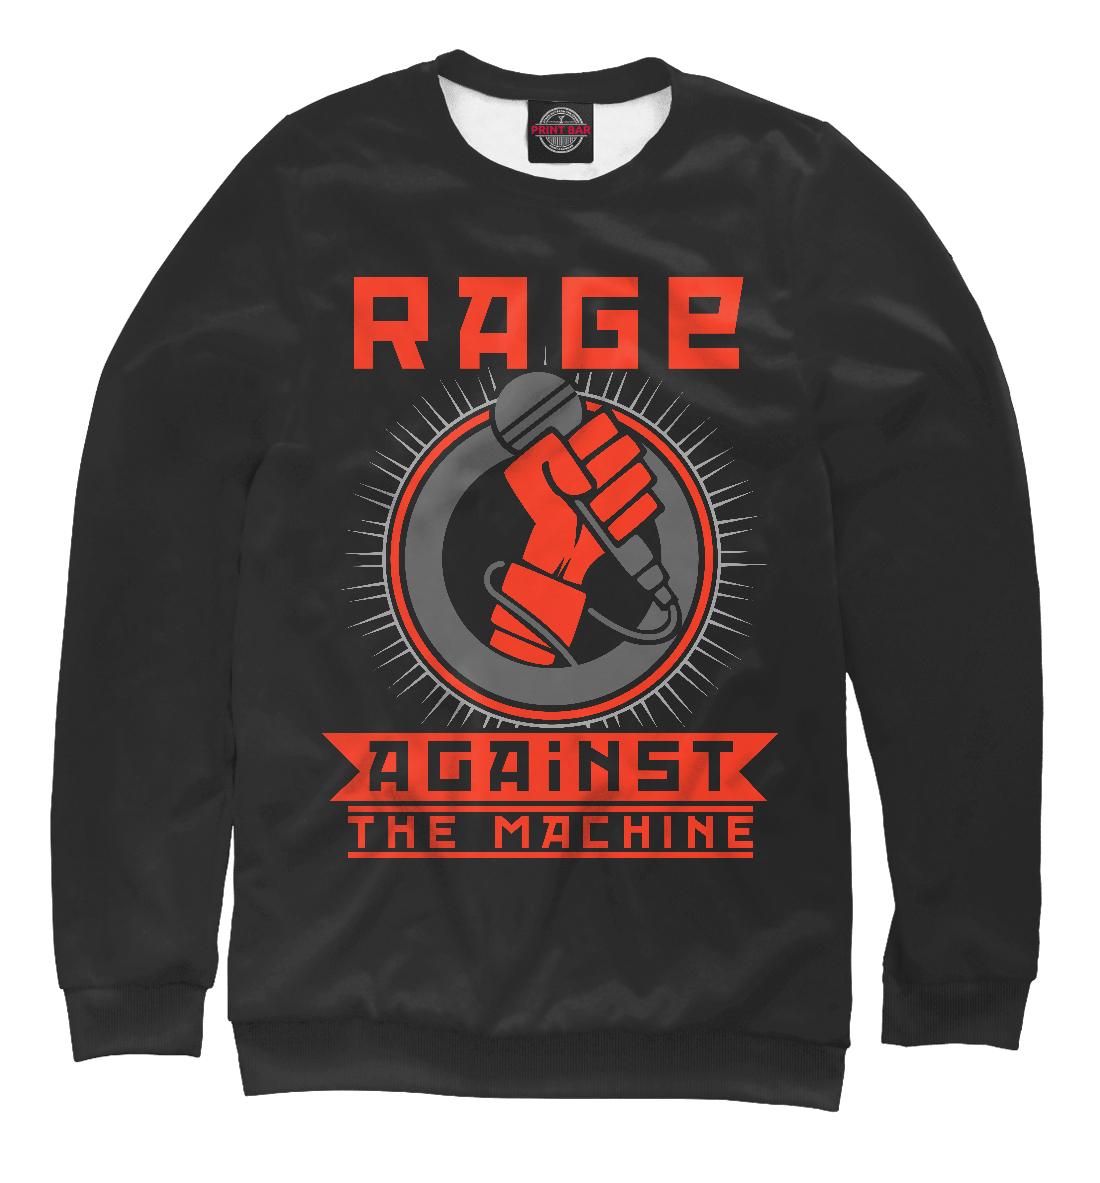 Купить Rage Against the Machine, Printbar, Свитшоты, RAM-356963-swi-2